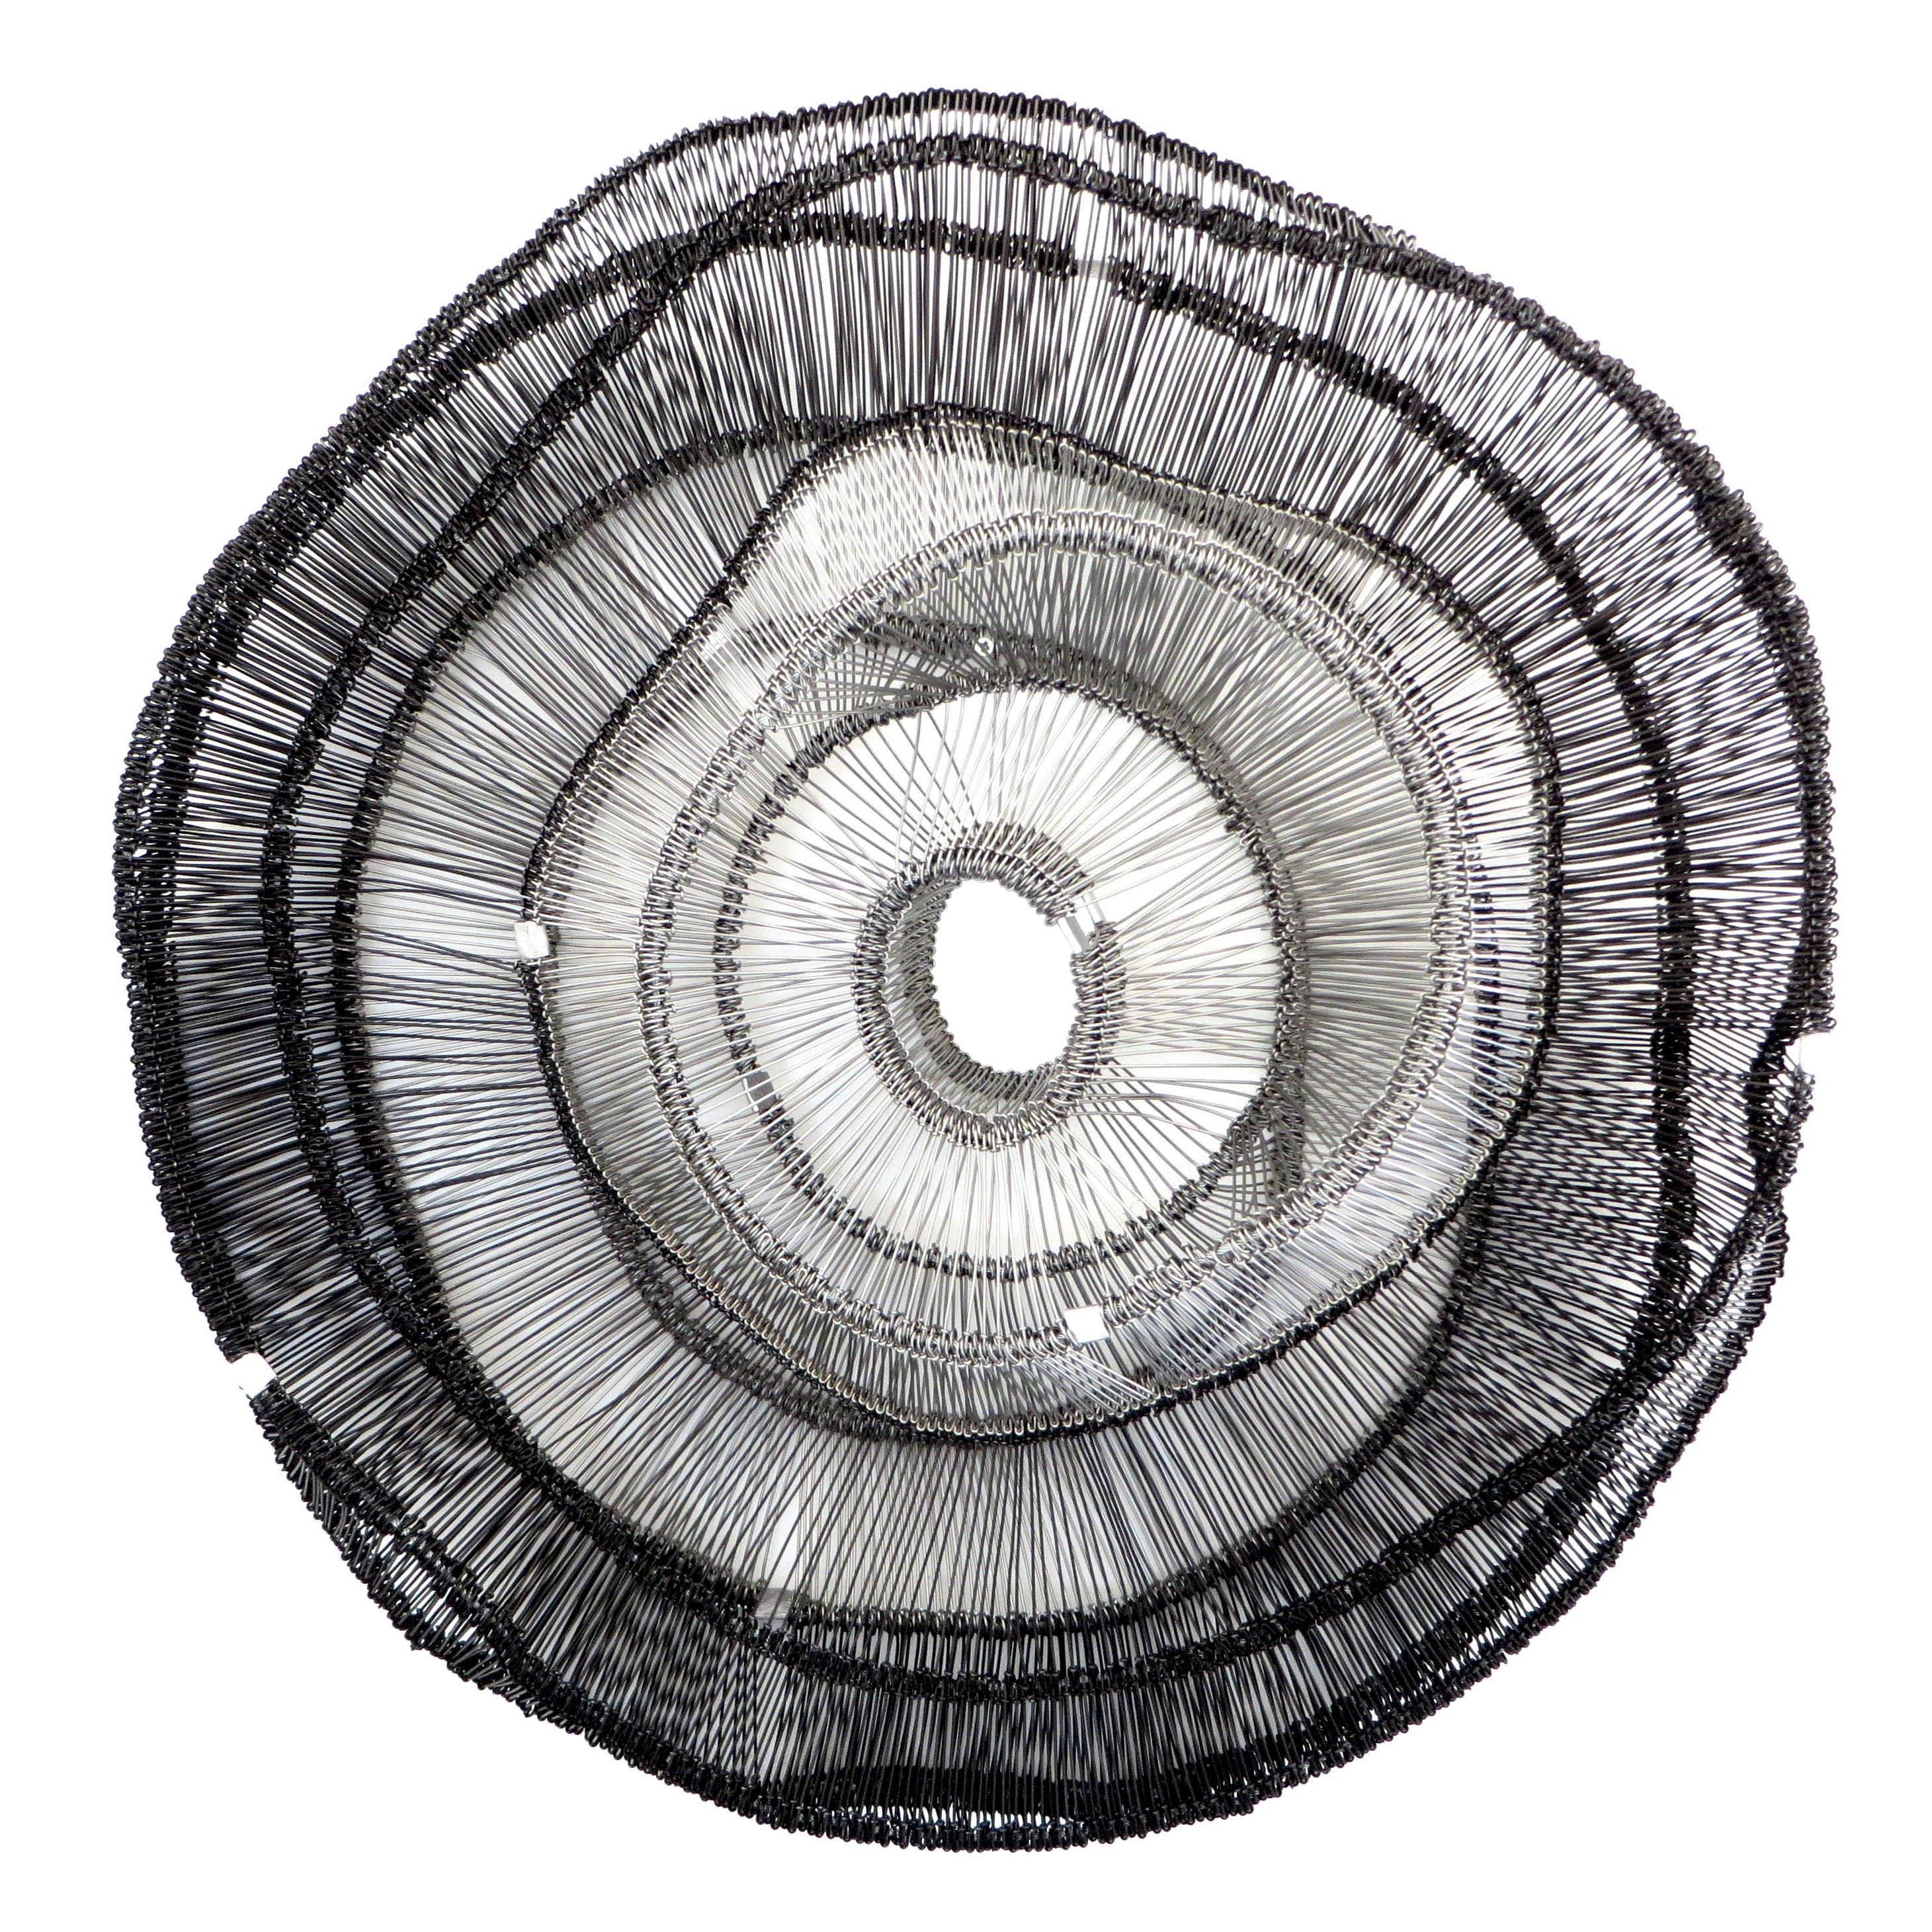 Artist Eric Gushee Emergence Series Woven Wire Wall Sculpture